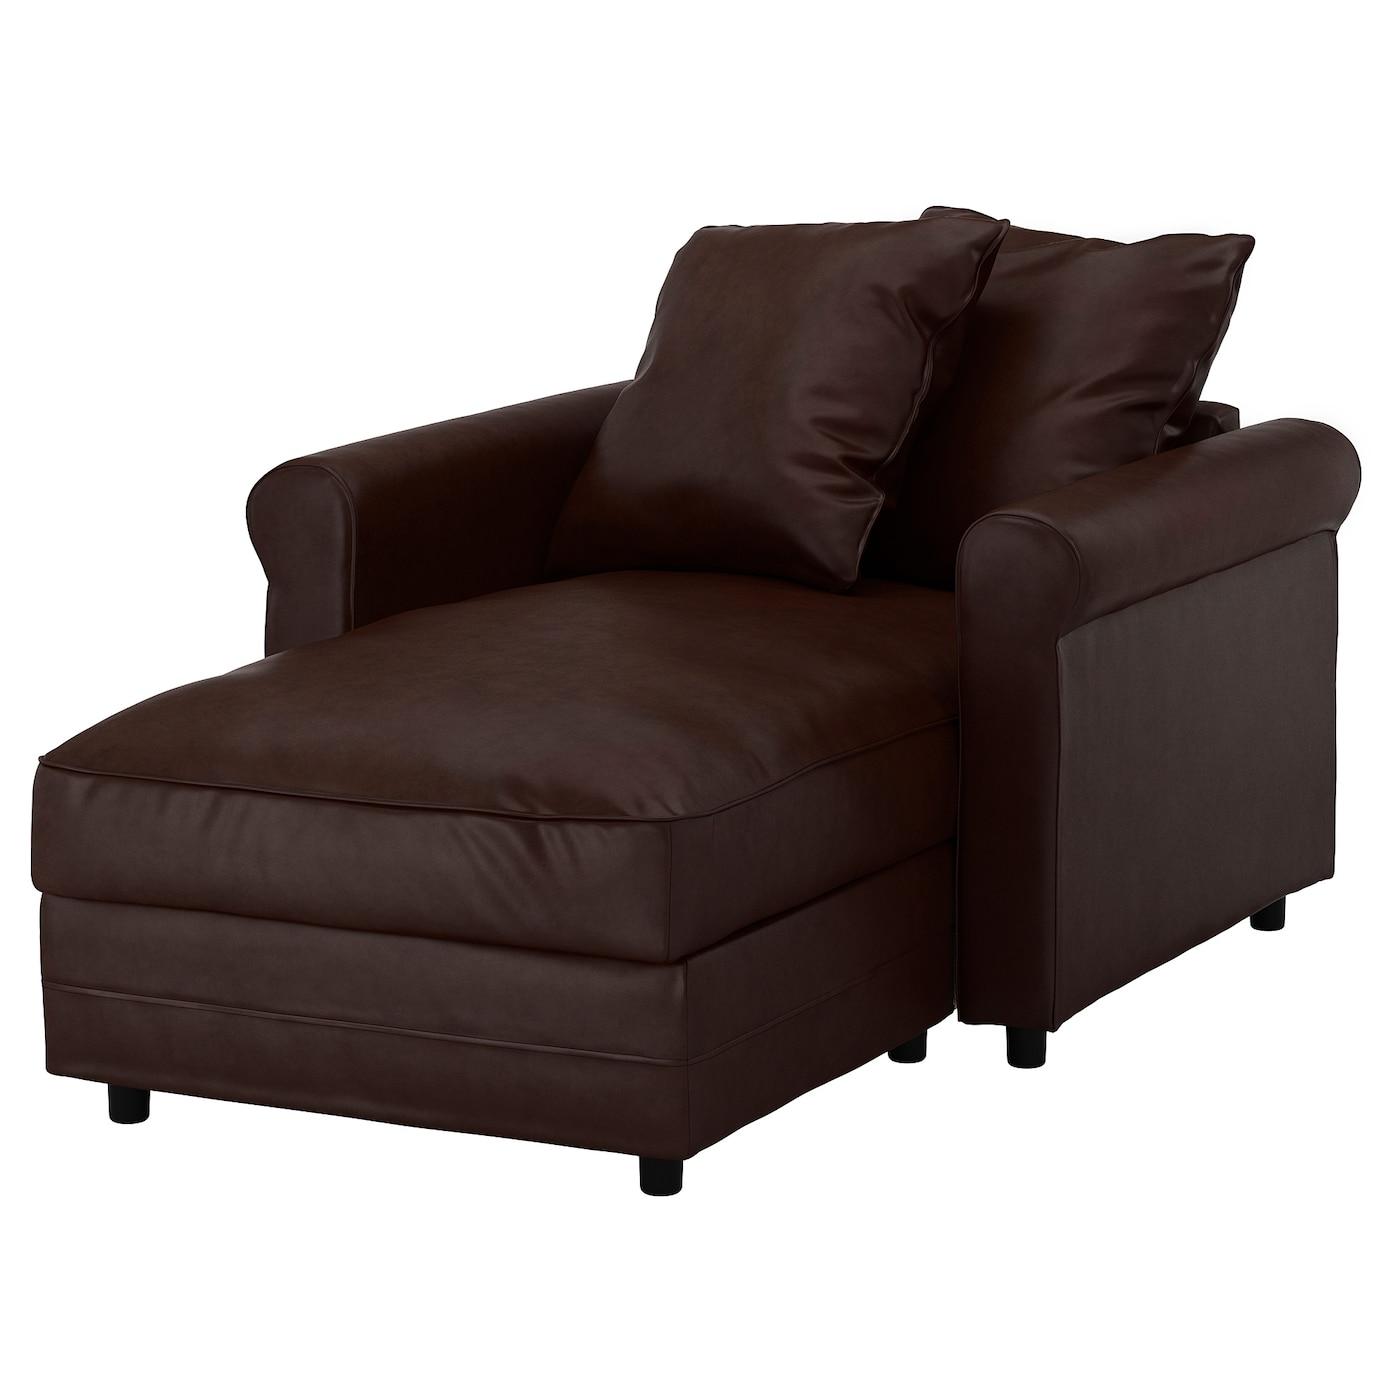 Chaises longues ikea - Copridivano chaise longue ikea ...